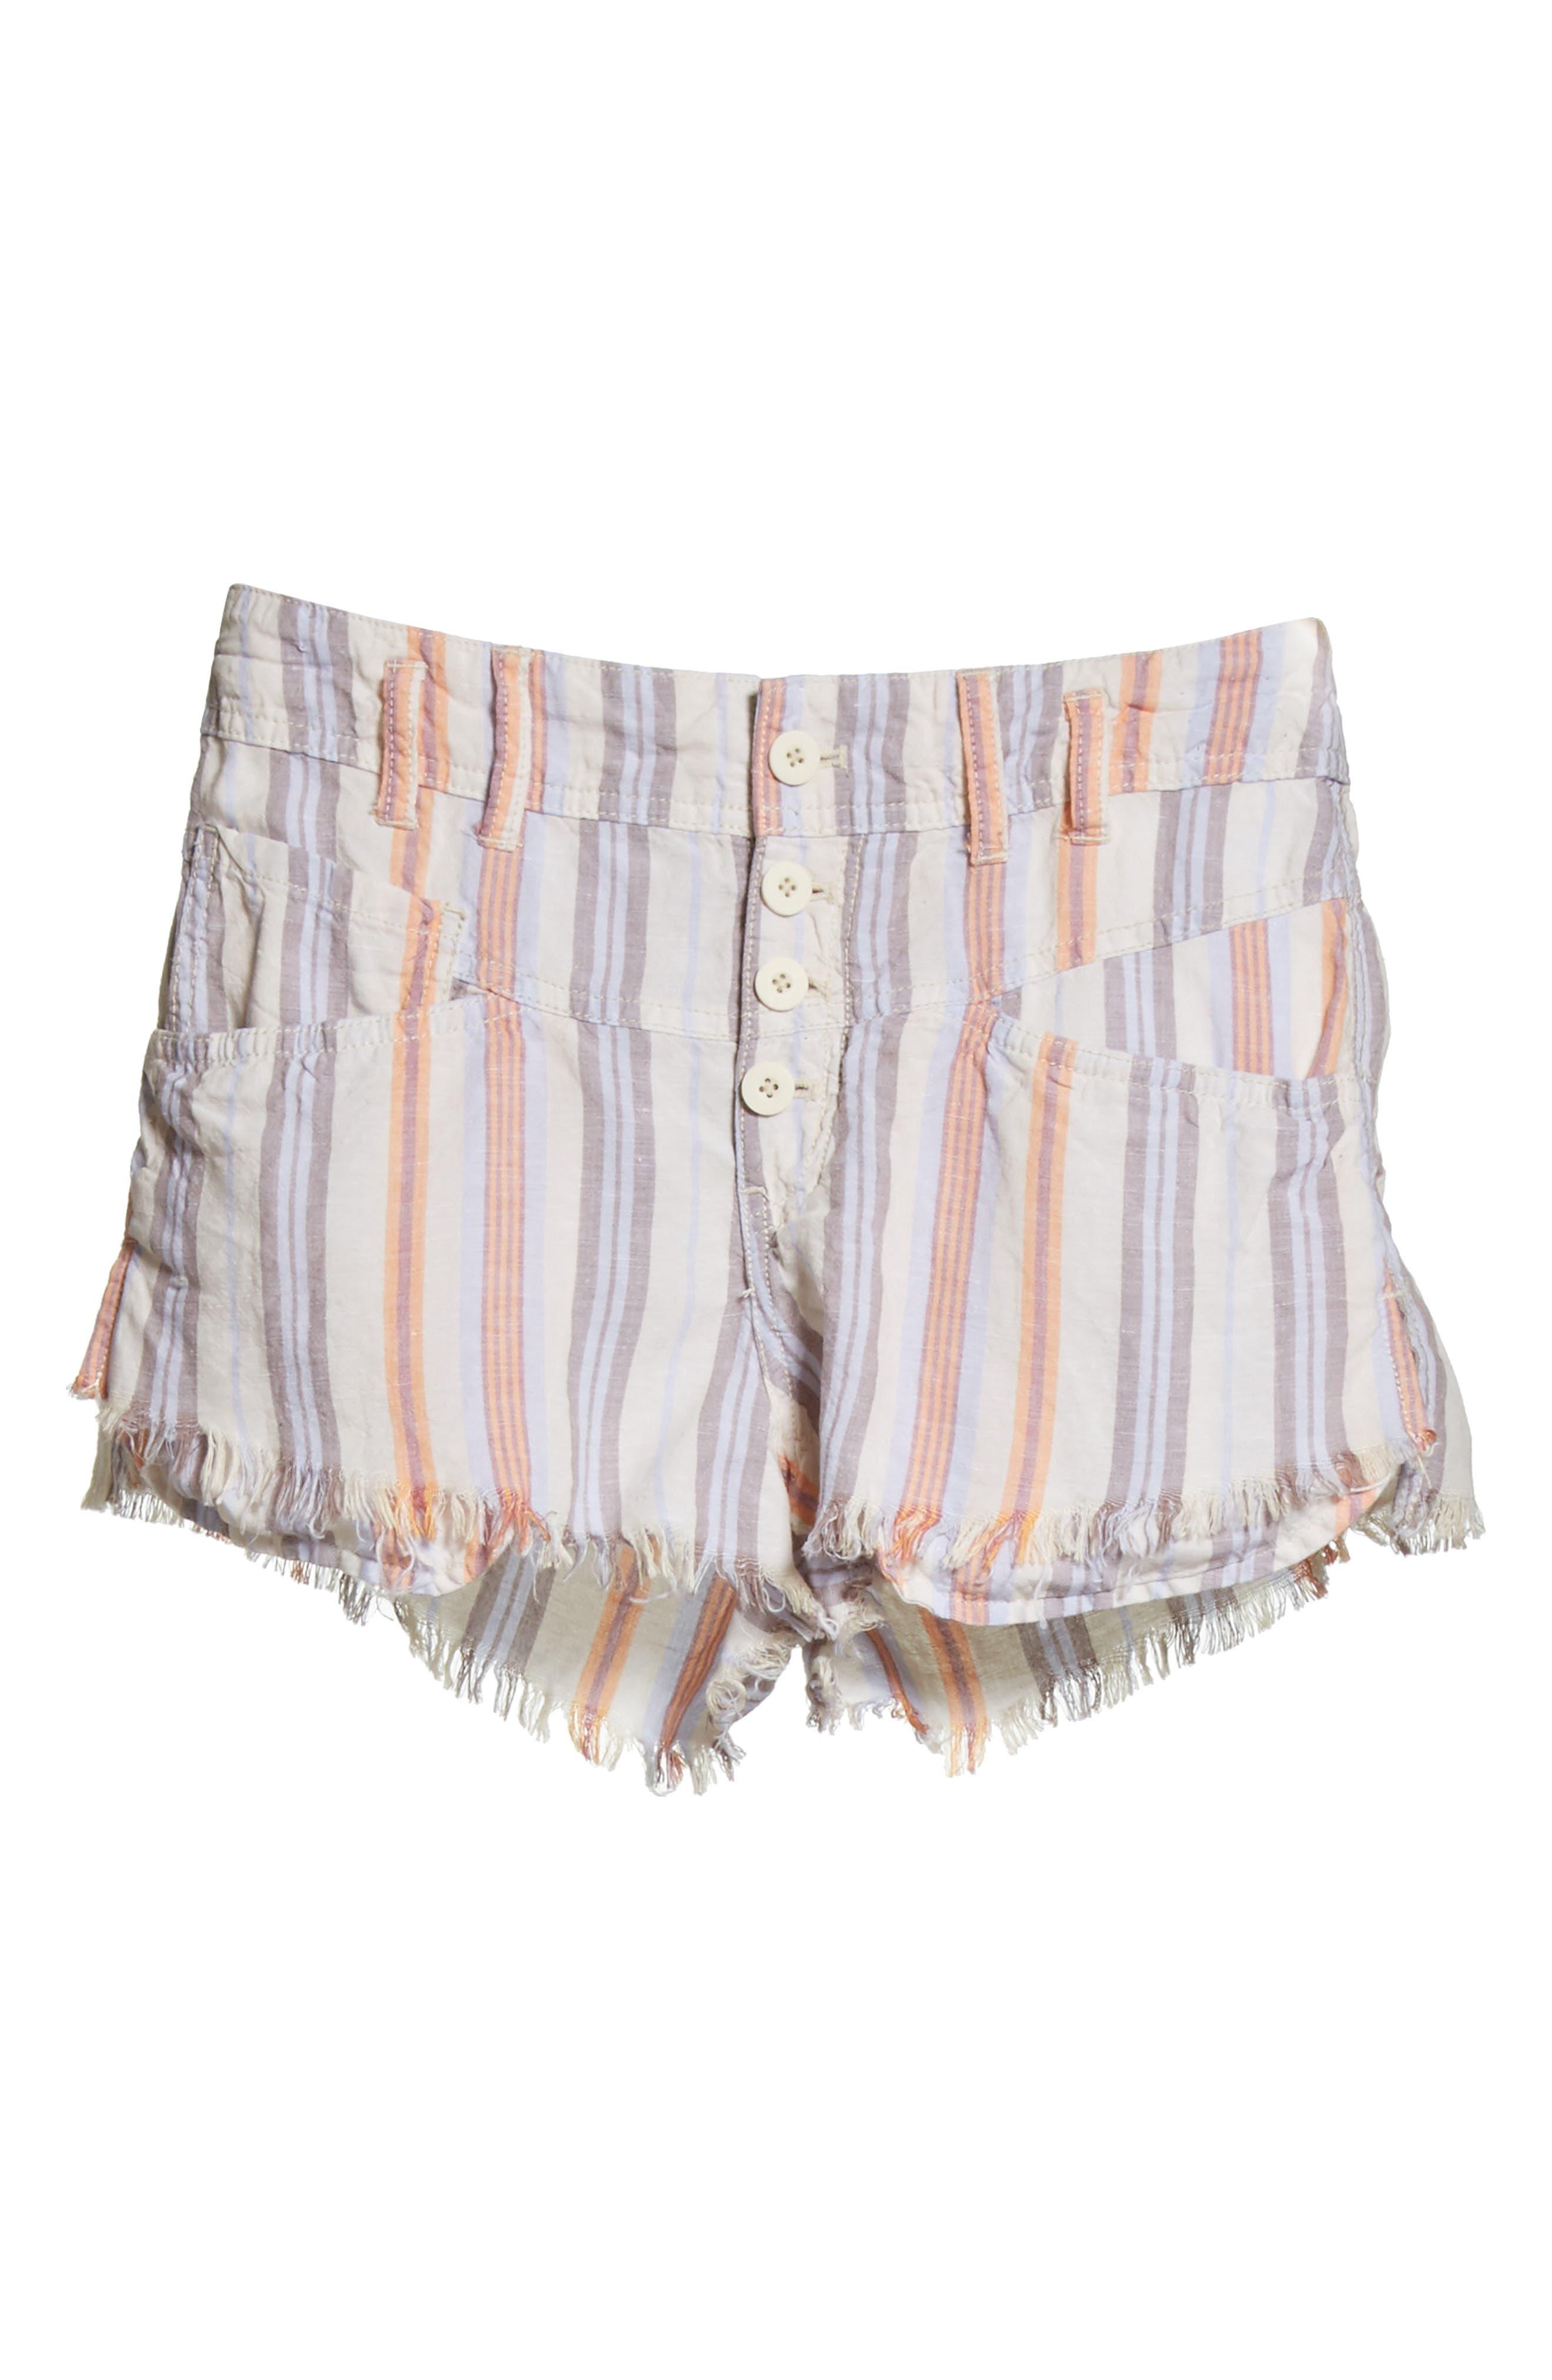 Morning Rain Cutoff Shorts,                             Alternate thumbnail 7, color,                             Nude